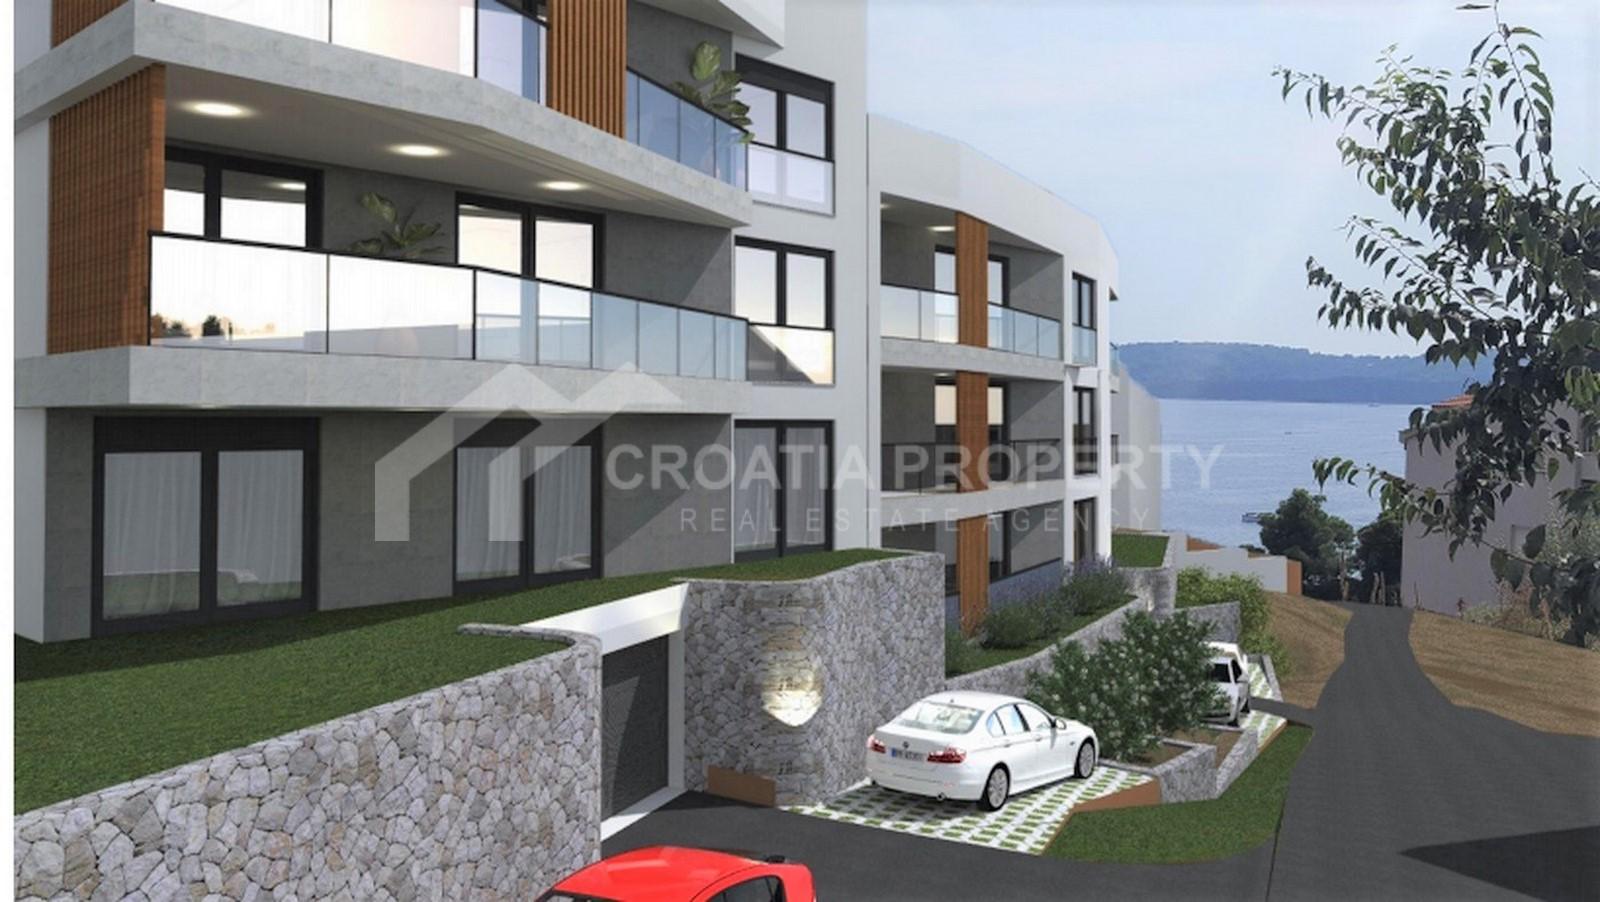 One-bedroom-apartments near Trogir center